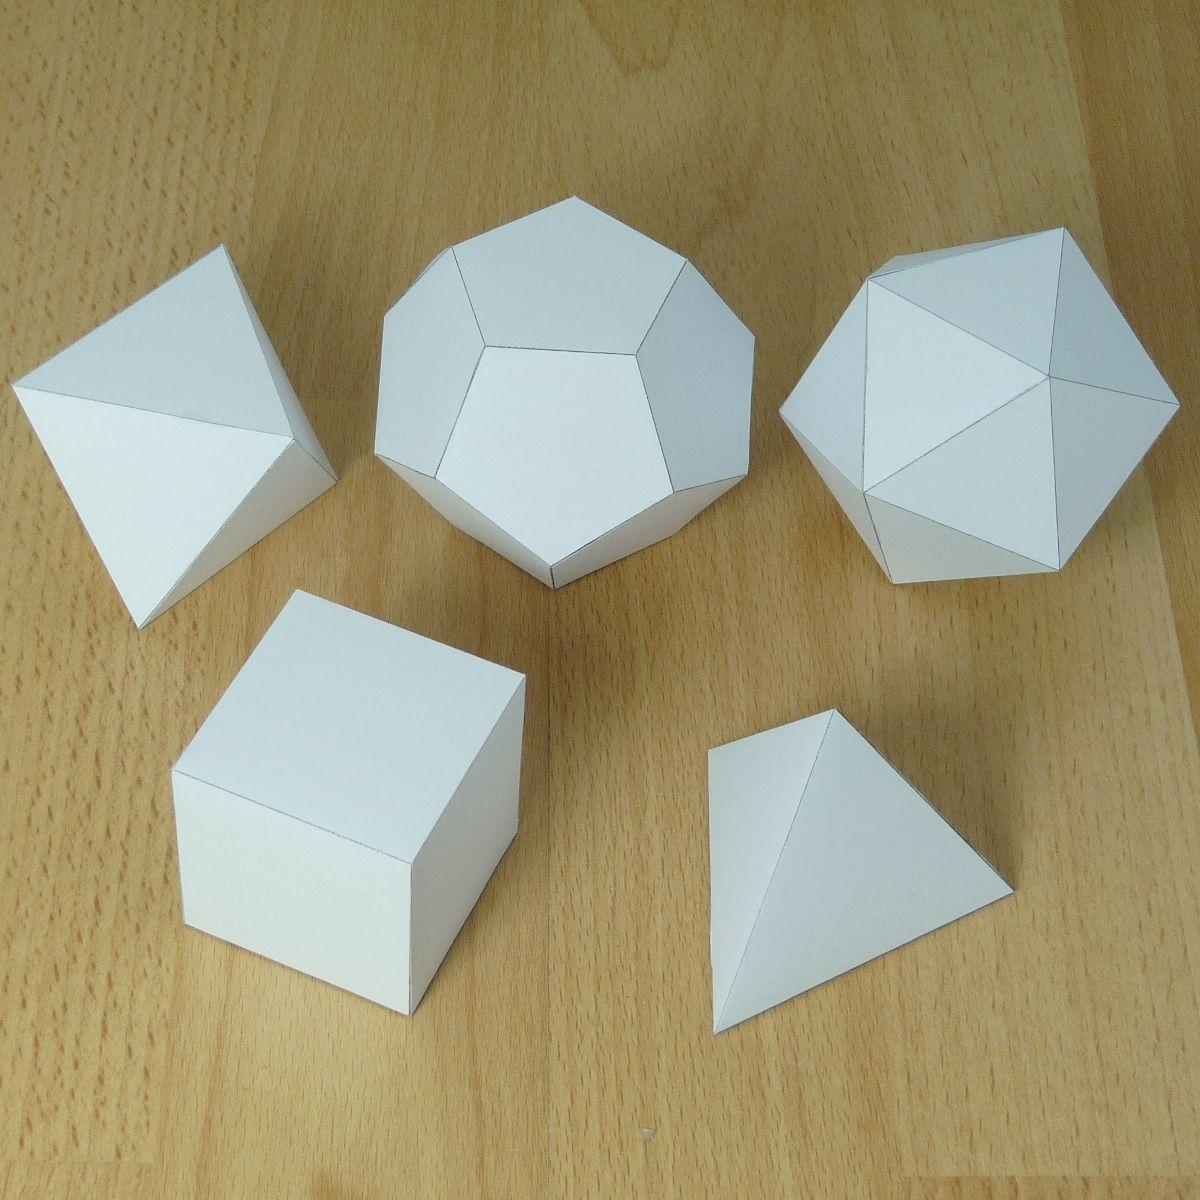 The 25+ best 3d geometric shapes ideas on Pinterest ... - photo#2